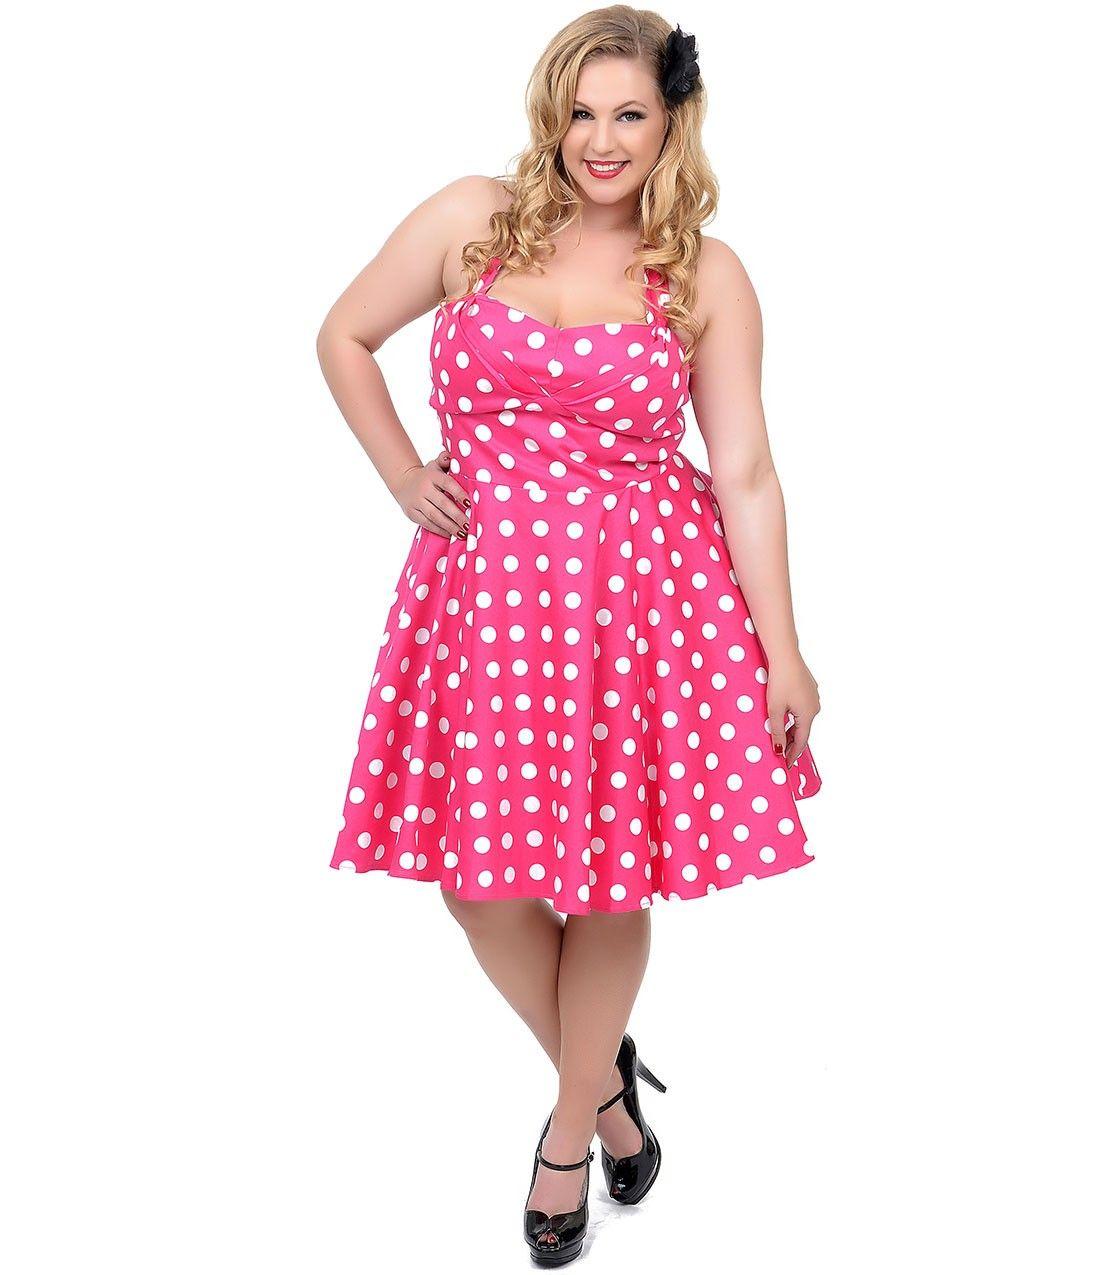 Plus Size Pink White Polka Dot Halter Fit N Flare Dress Rosemary